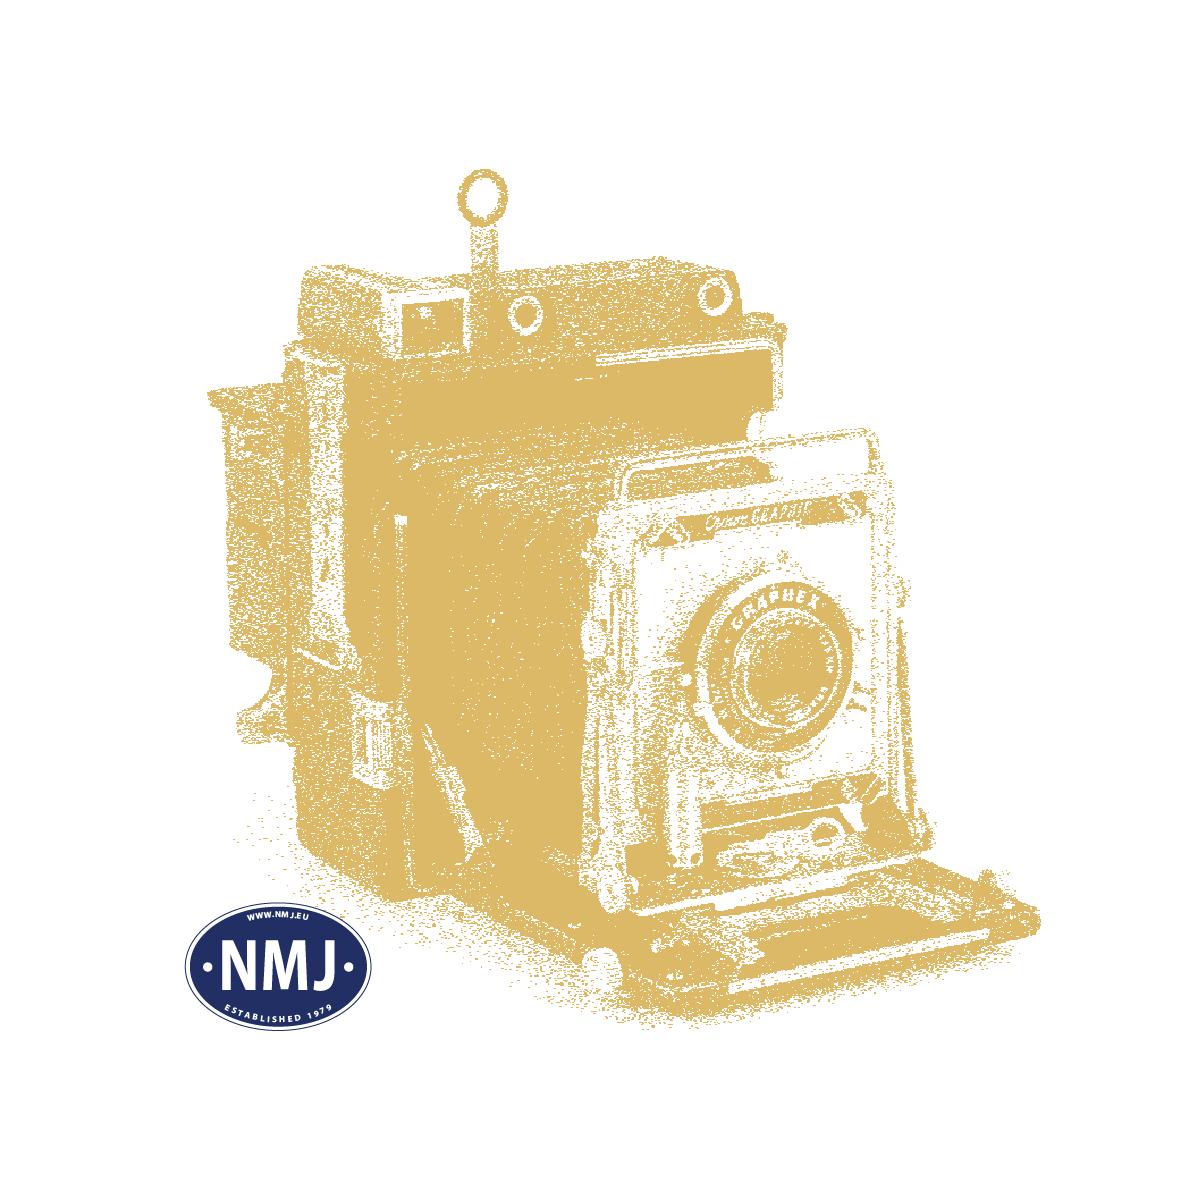 NMJT81.301 - NMJ Topline NSB BM73b, Intercity Rot, AC